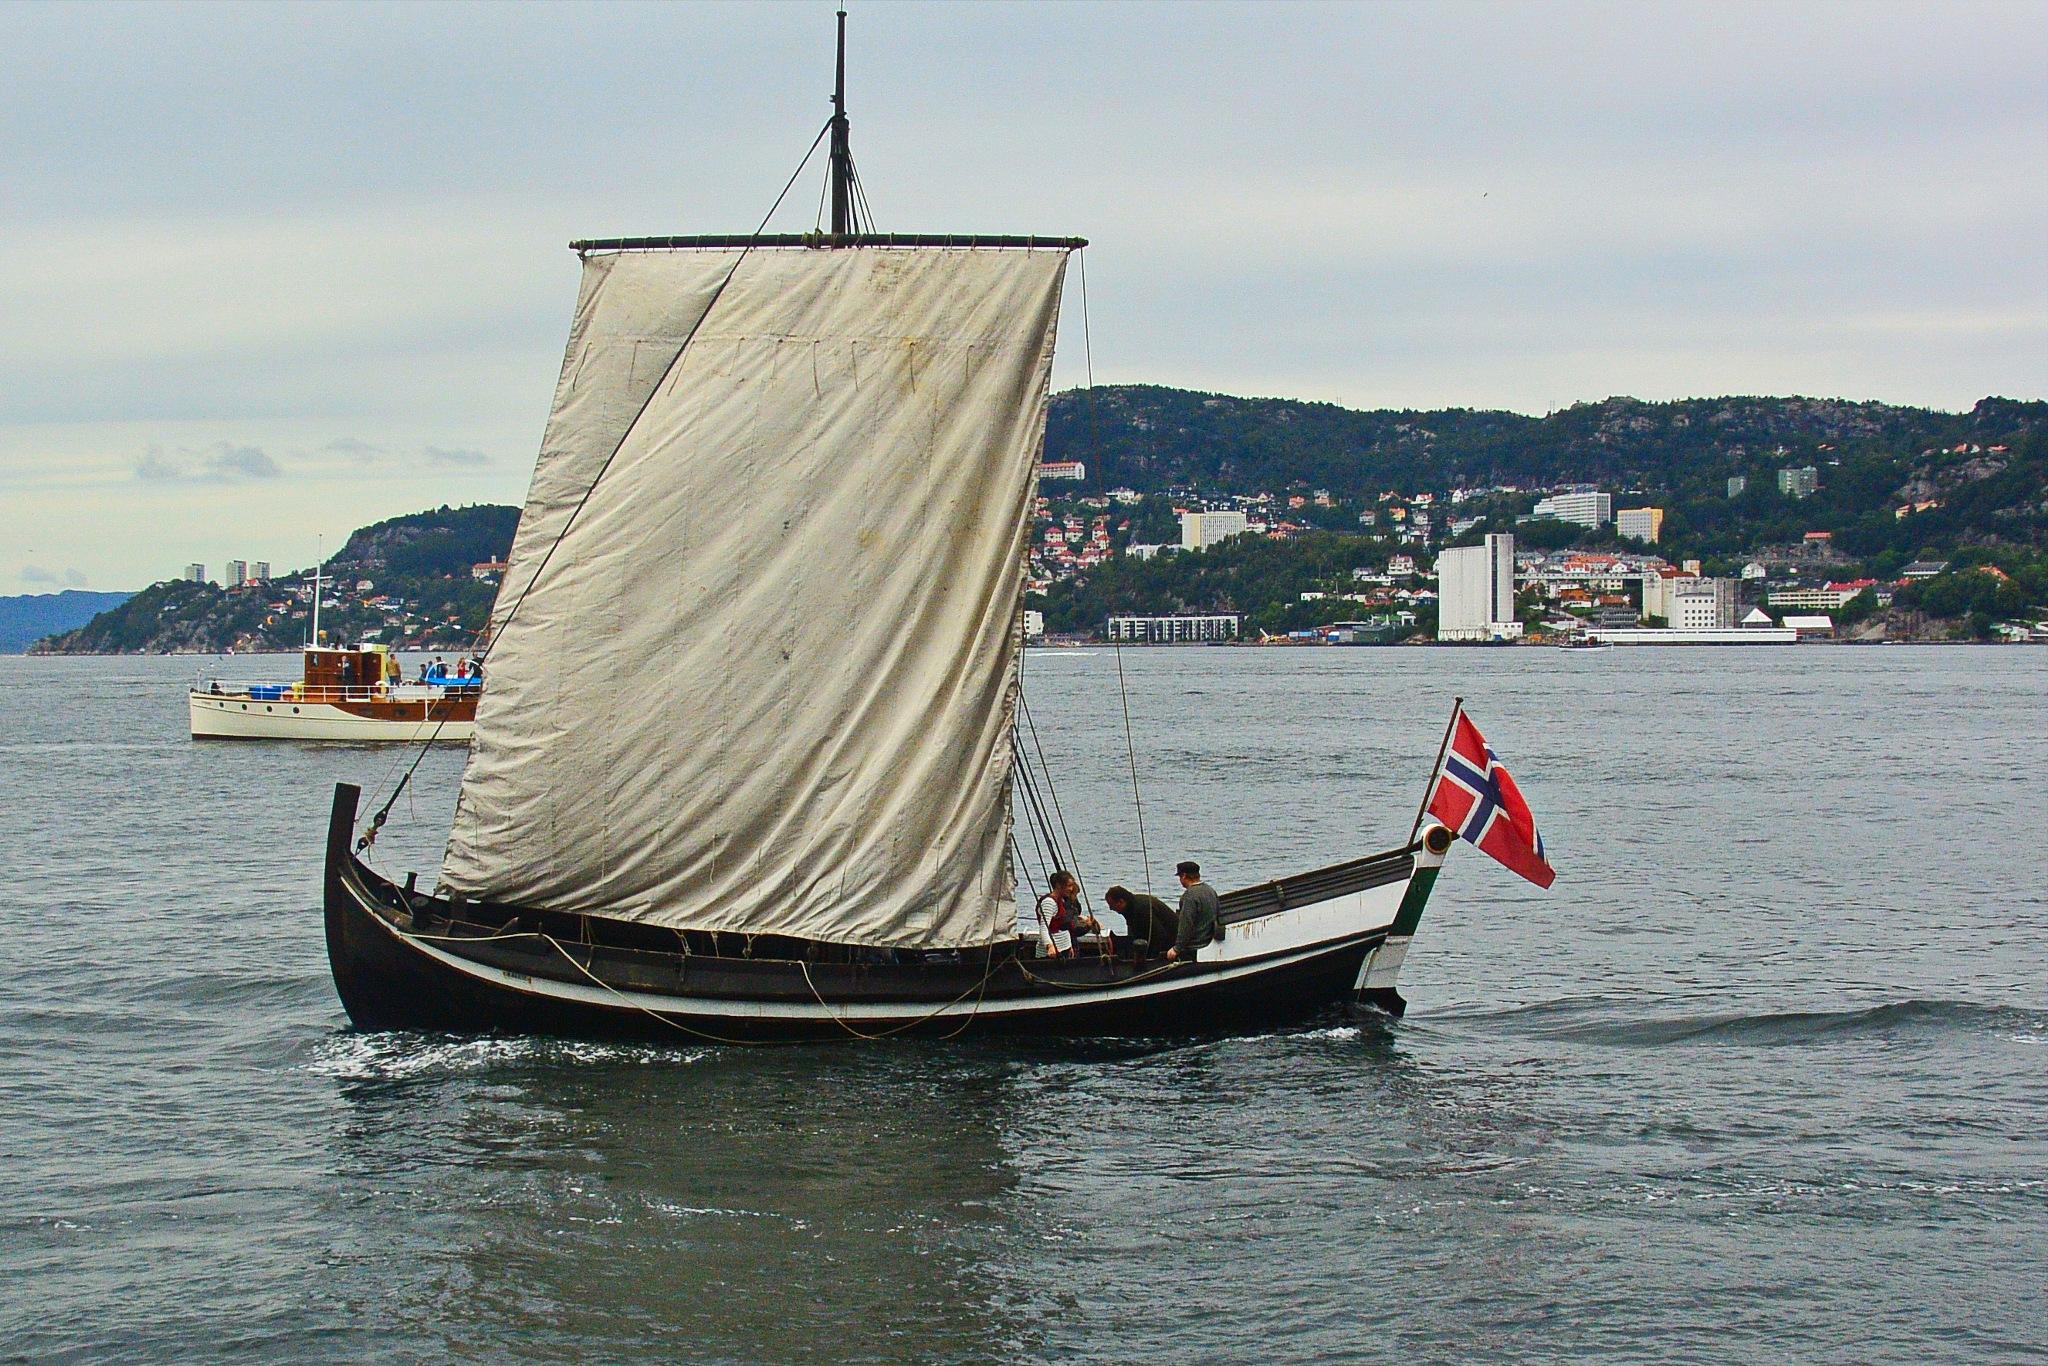 Nostalgia - 18th century boat by Per Molvik